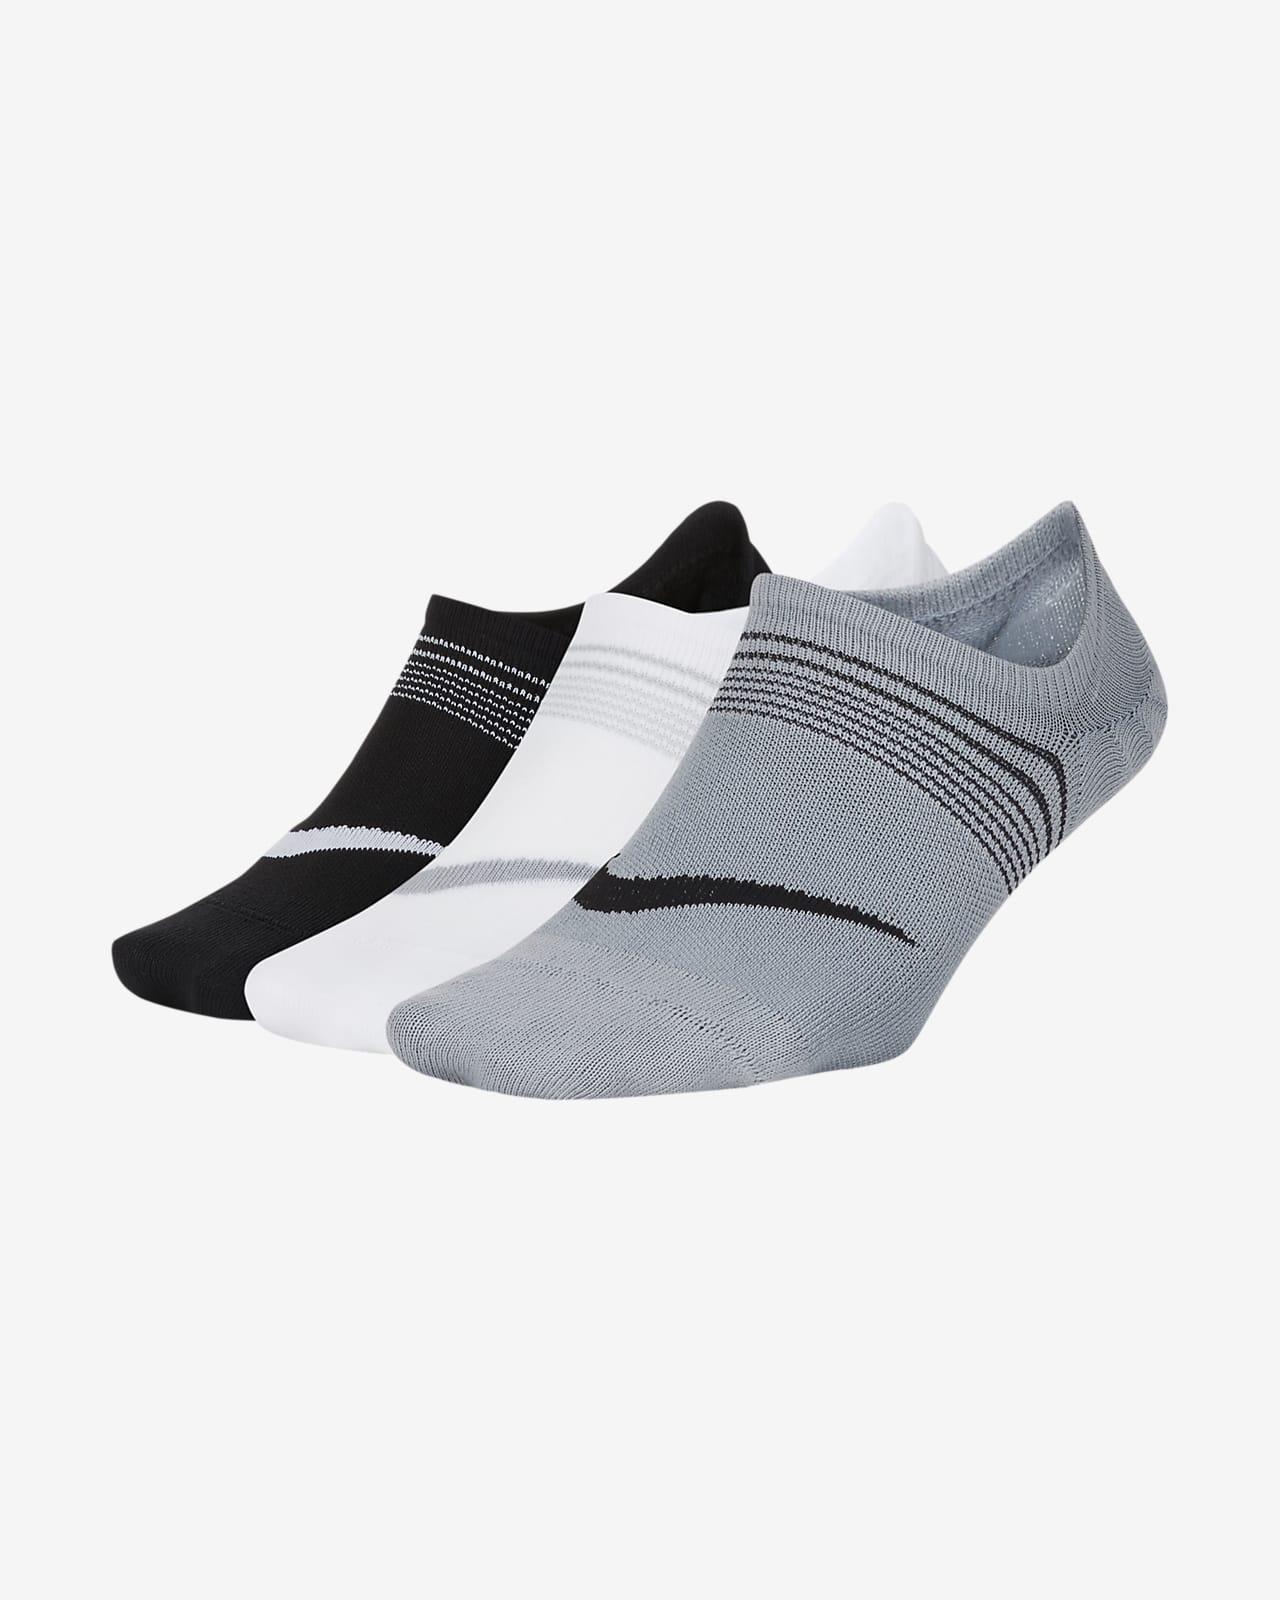 Nike Everyday Plus Lightweight Women's Training Footie Socks (3 Pairs)